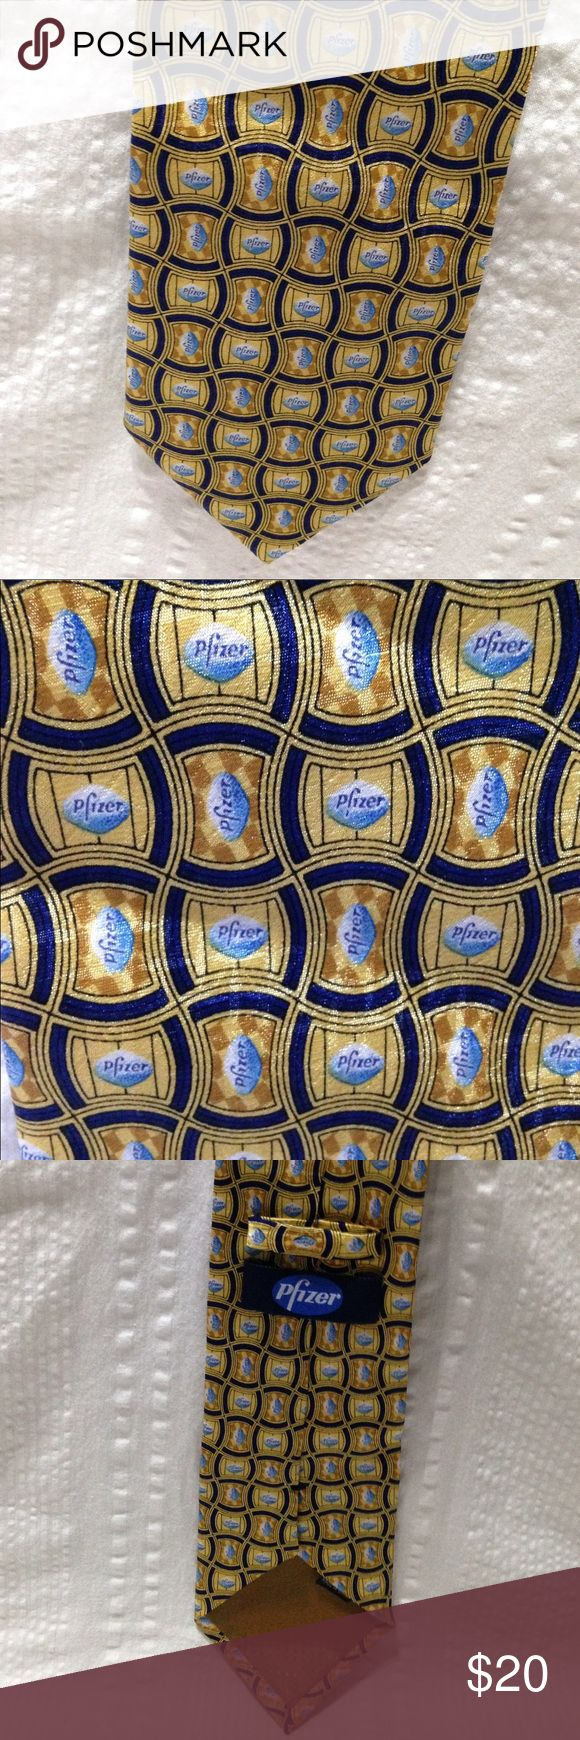 Selling this Pfizer Viagra necktie tie advertising drugs on Poshmark! My username is: onemanstrashwp. #shopmycloset #poshmark #fashion #shopping #style #forsale #Pfizer #Other